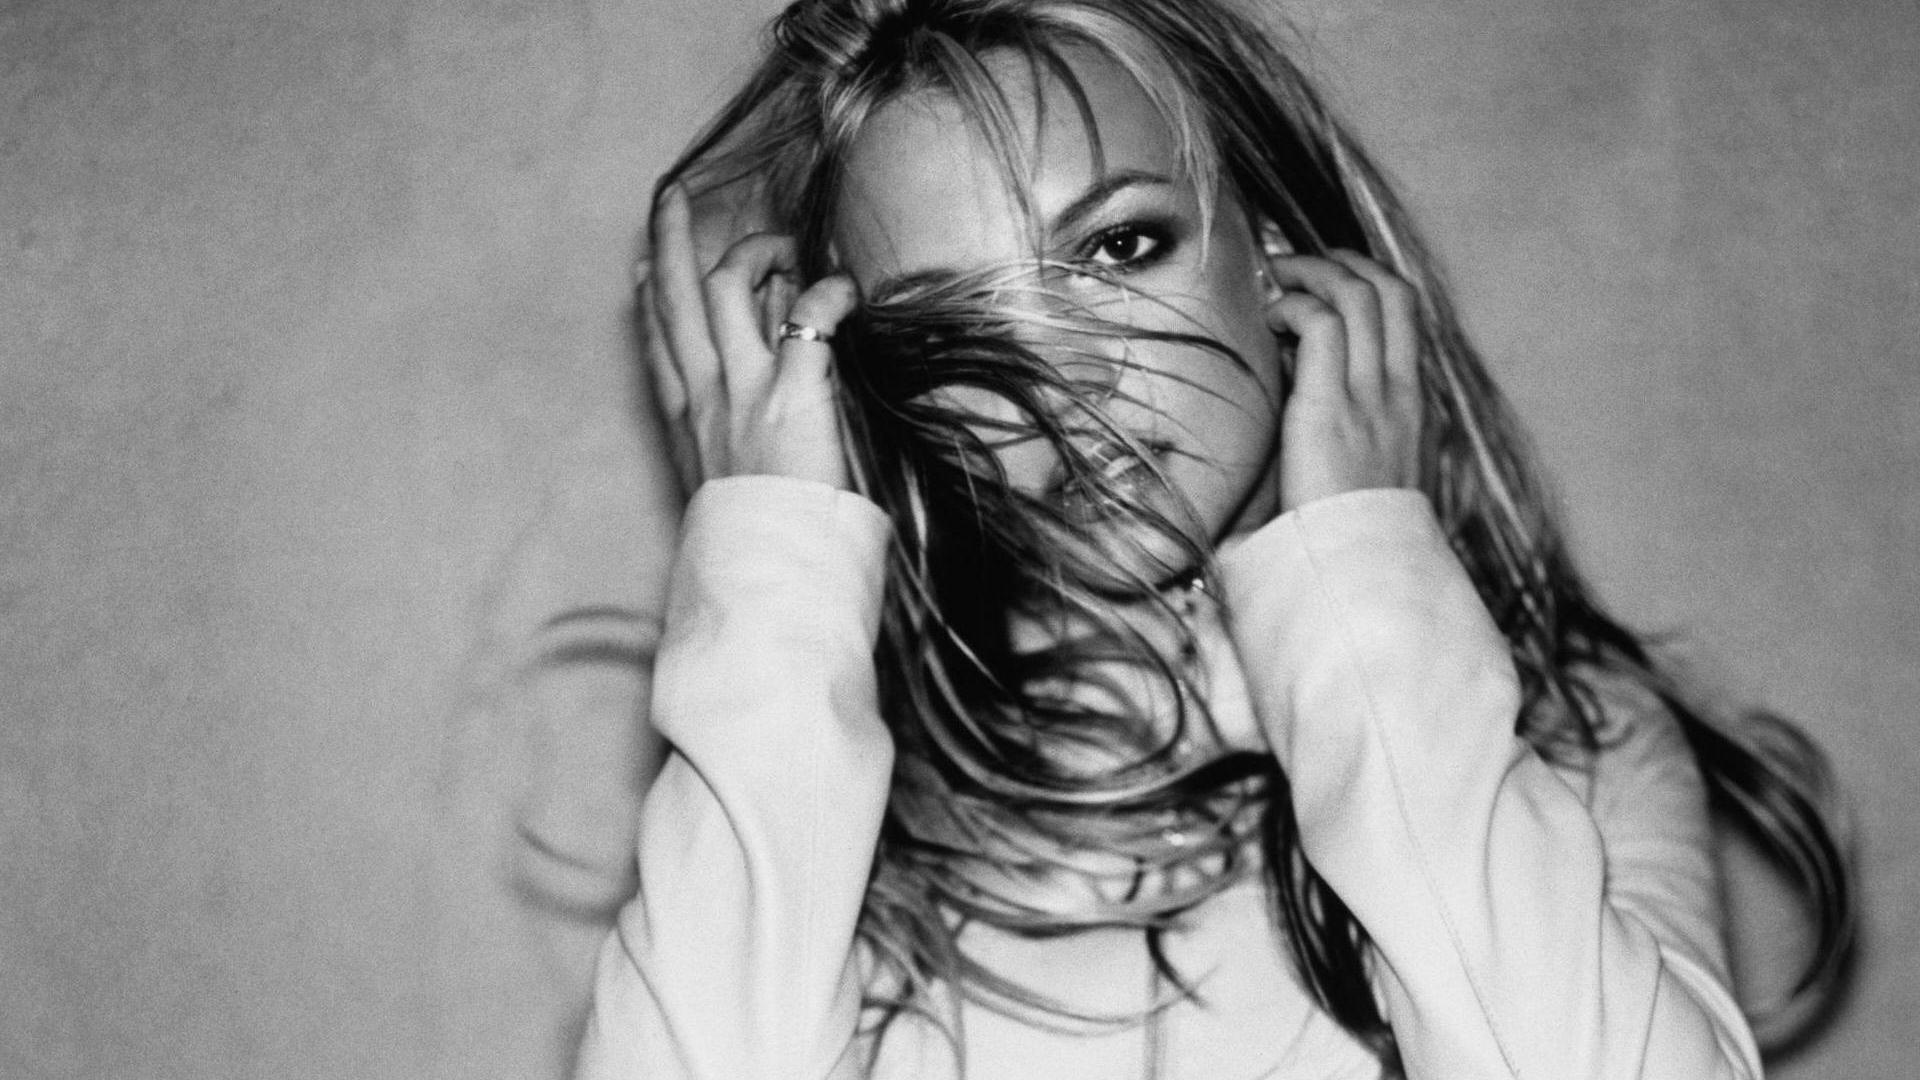 Britney free movie skye